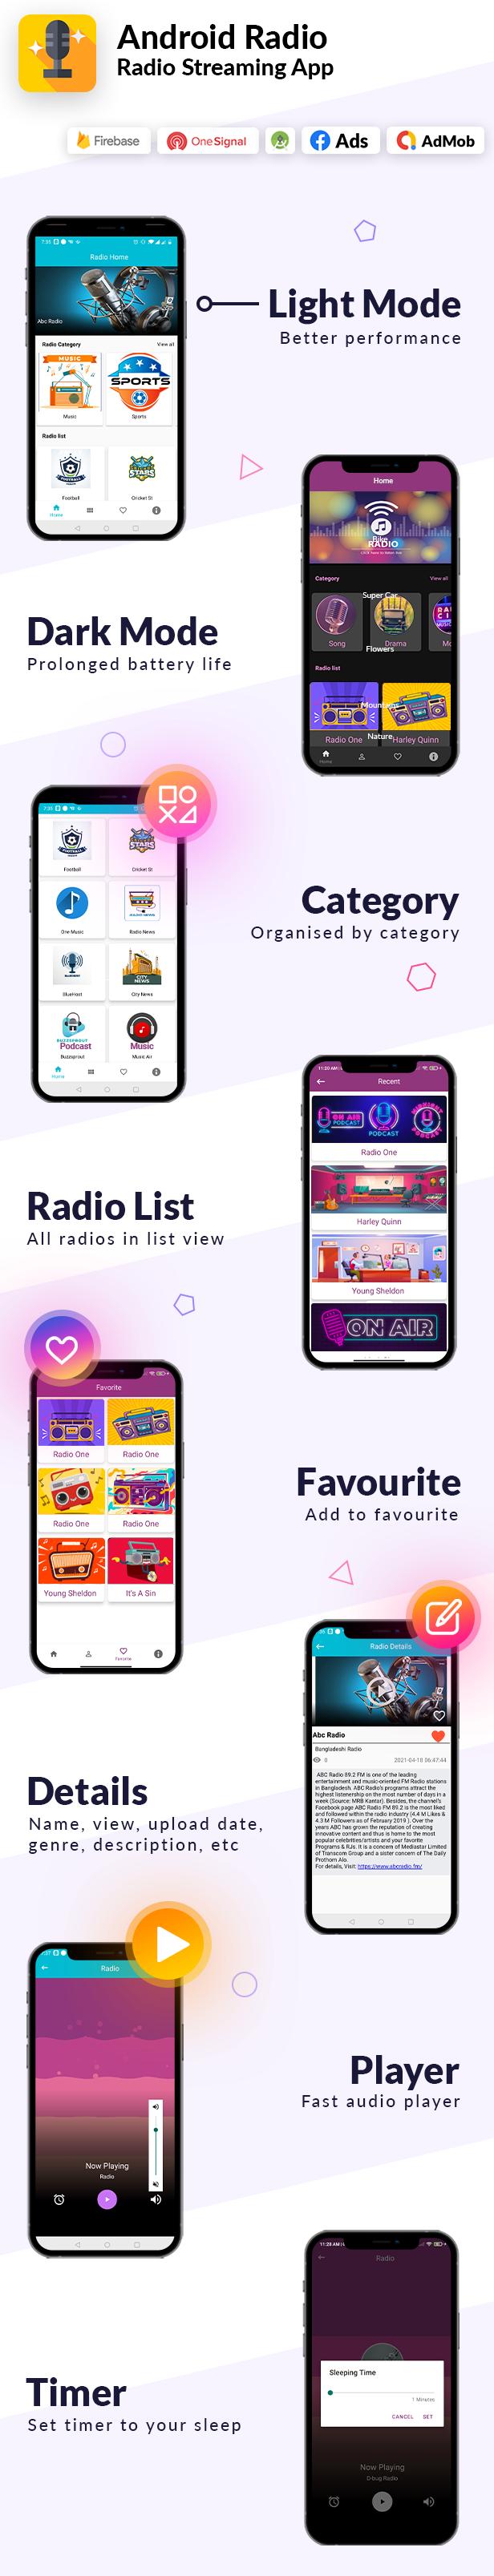 Radio App Android Online | Admob, Facebook, Startapp - 4